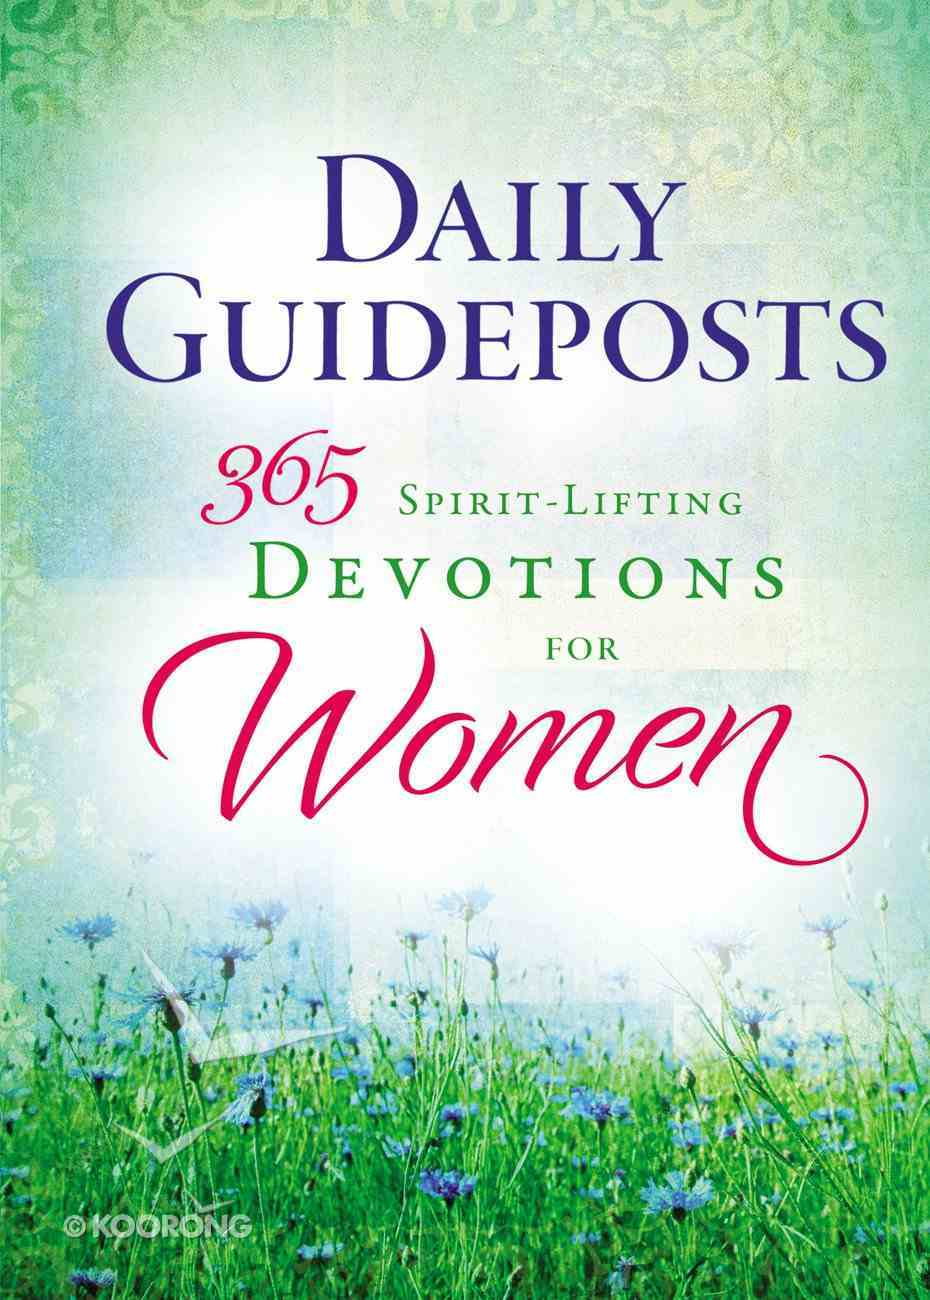 Daily Guideposts: 365 Spirit-Lifting Devotions For Women Hardback